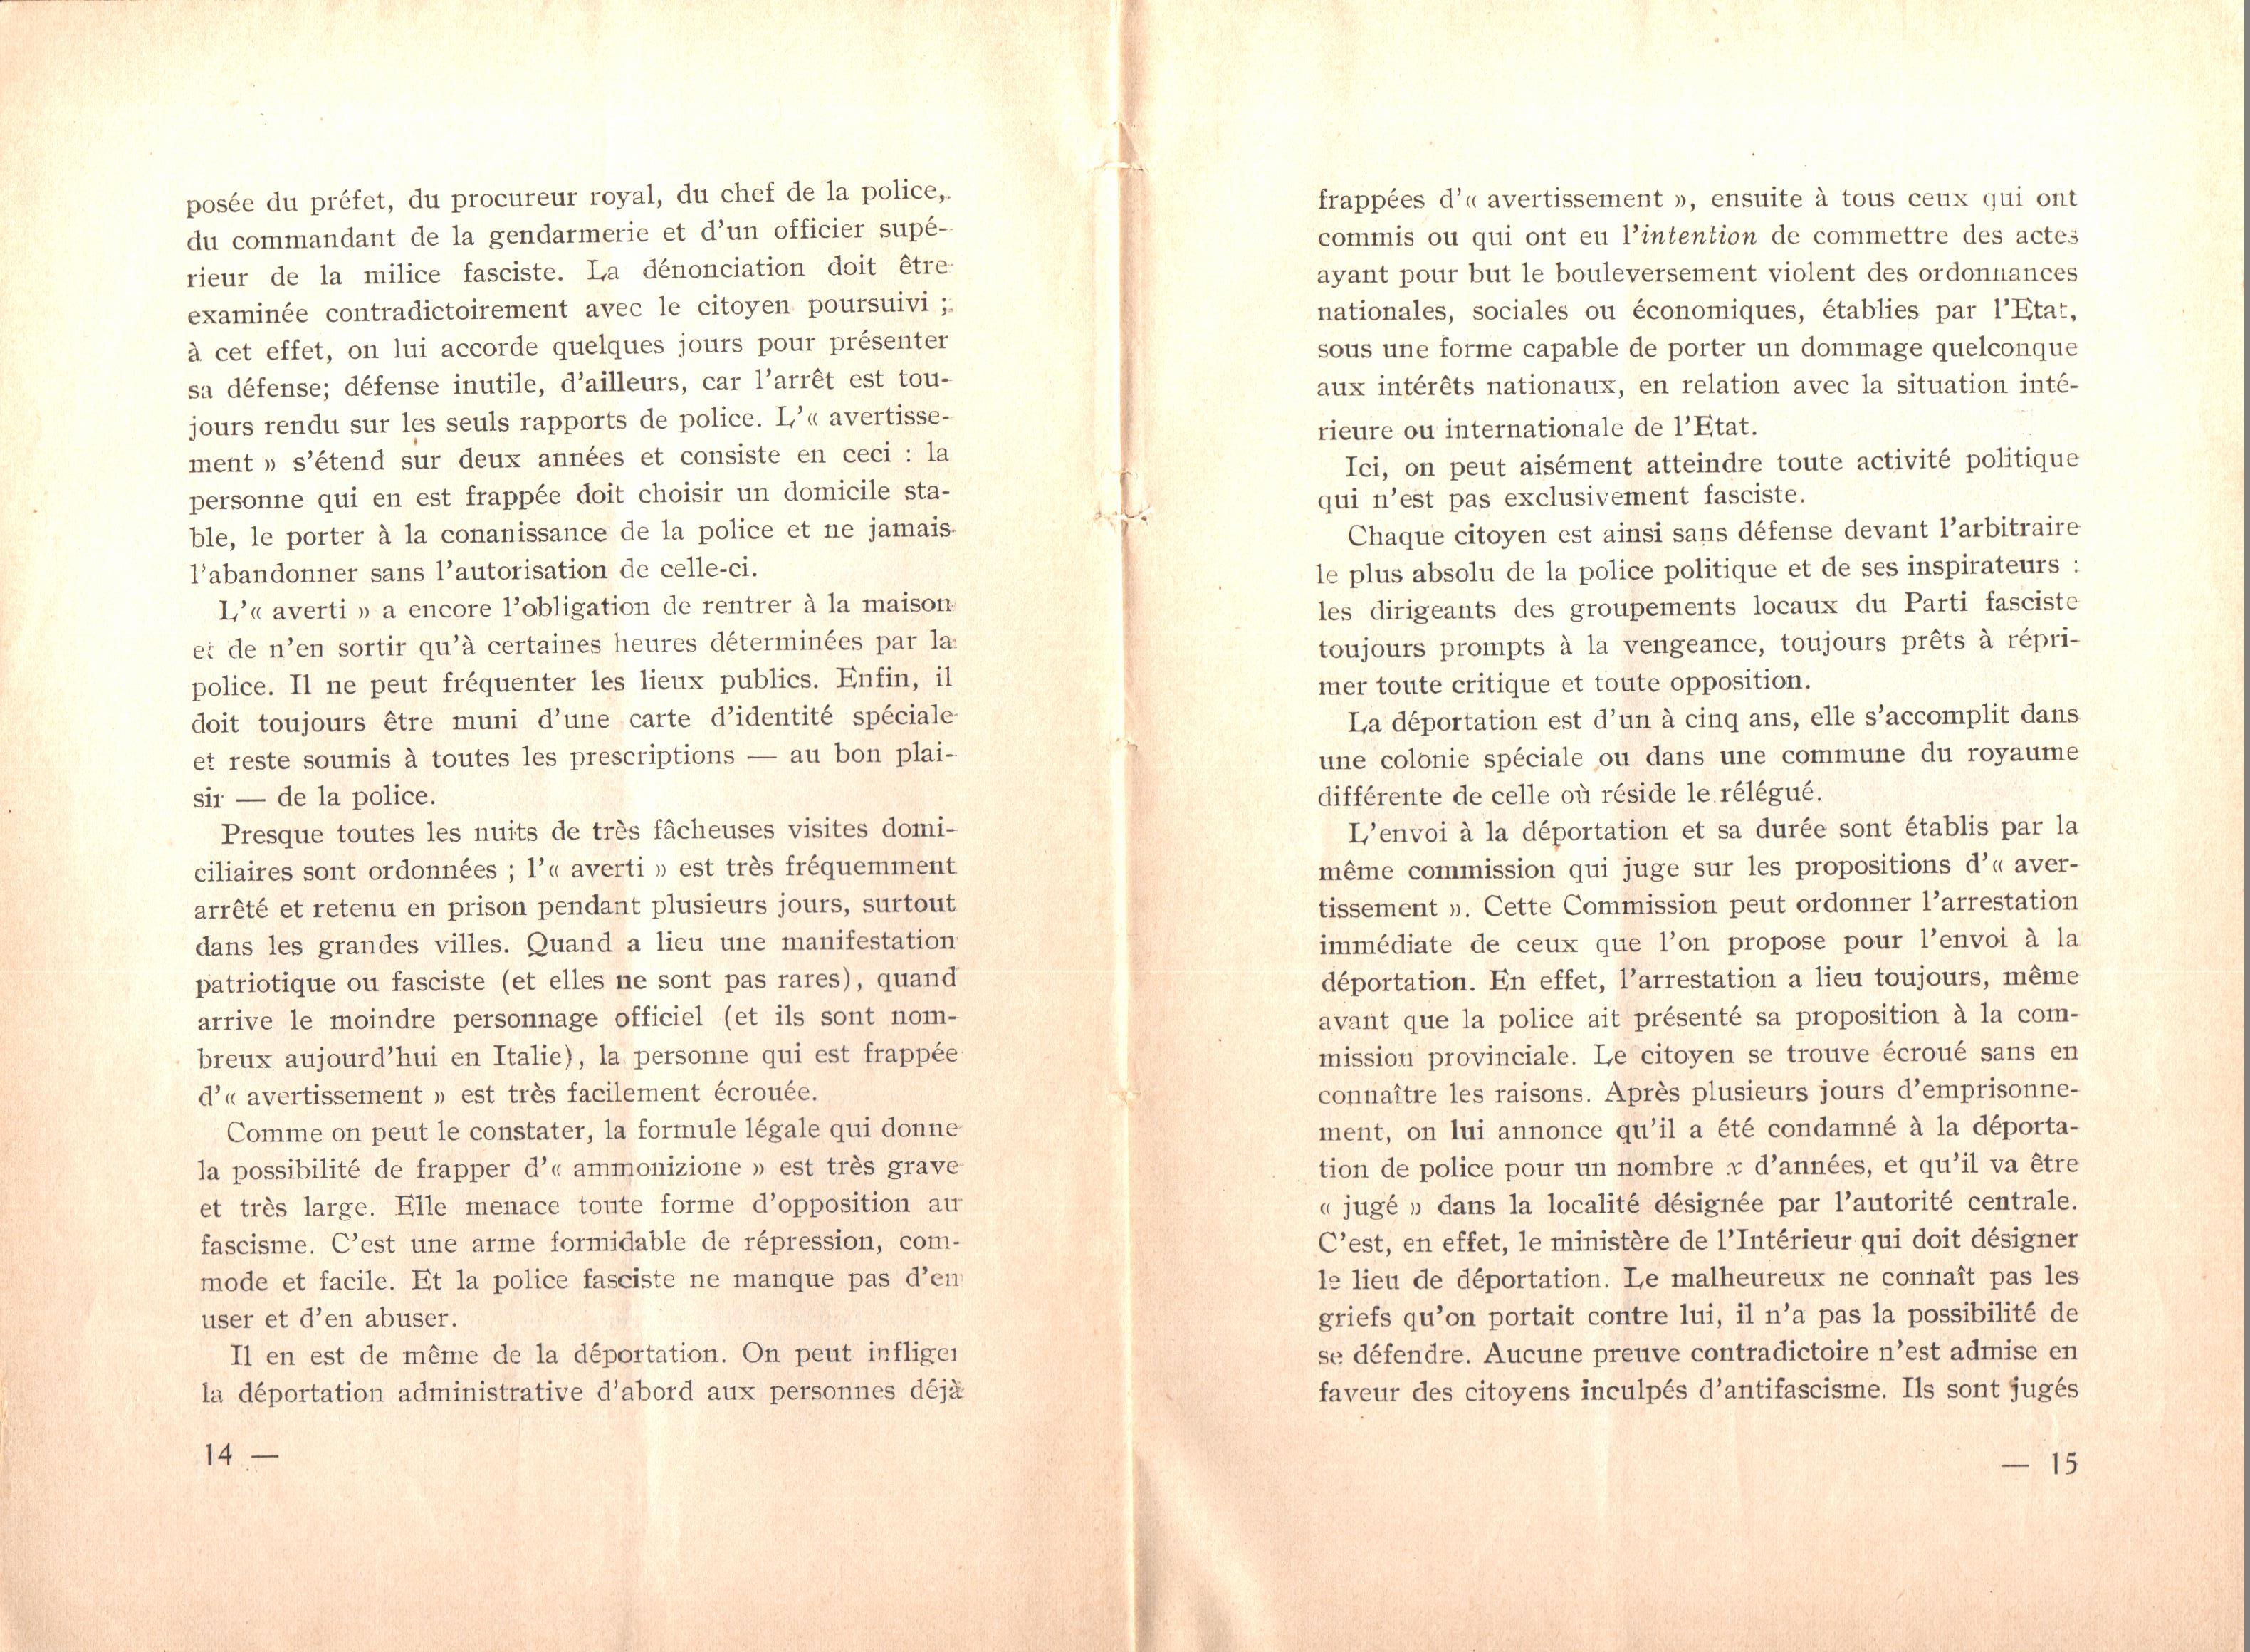 Nicola Cilla, Les «Cayennes» d'Italie - pag. 9